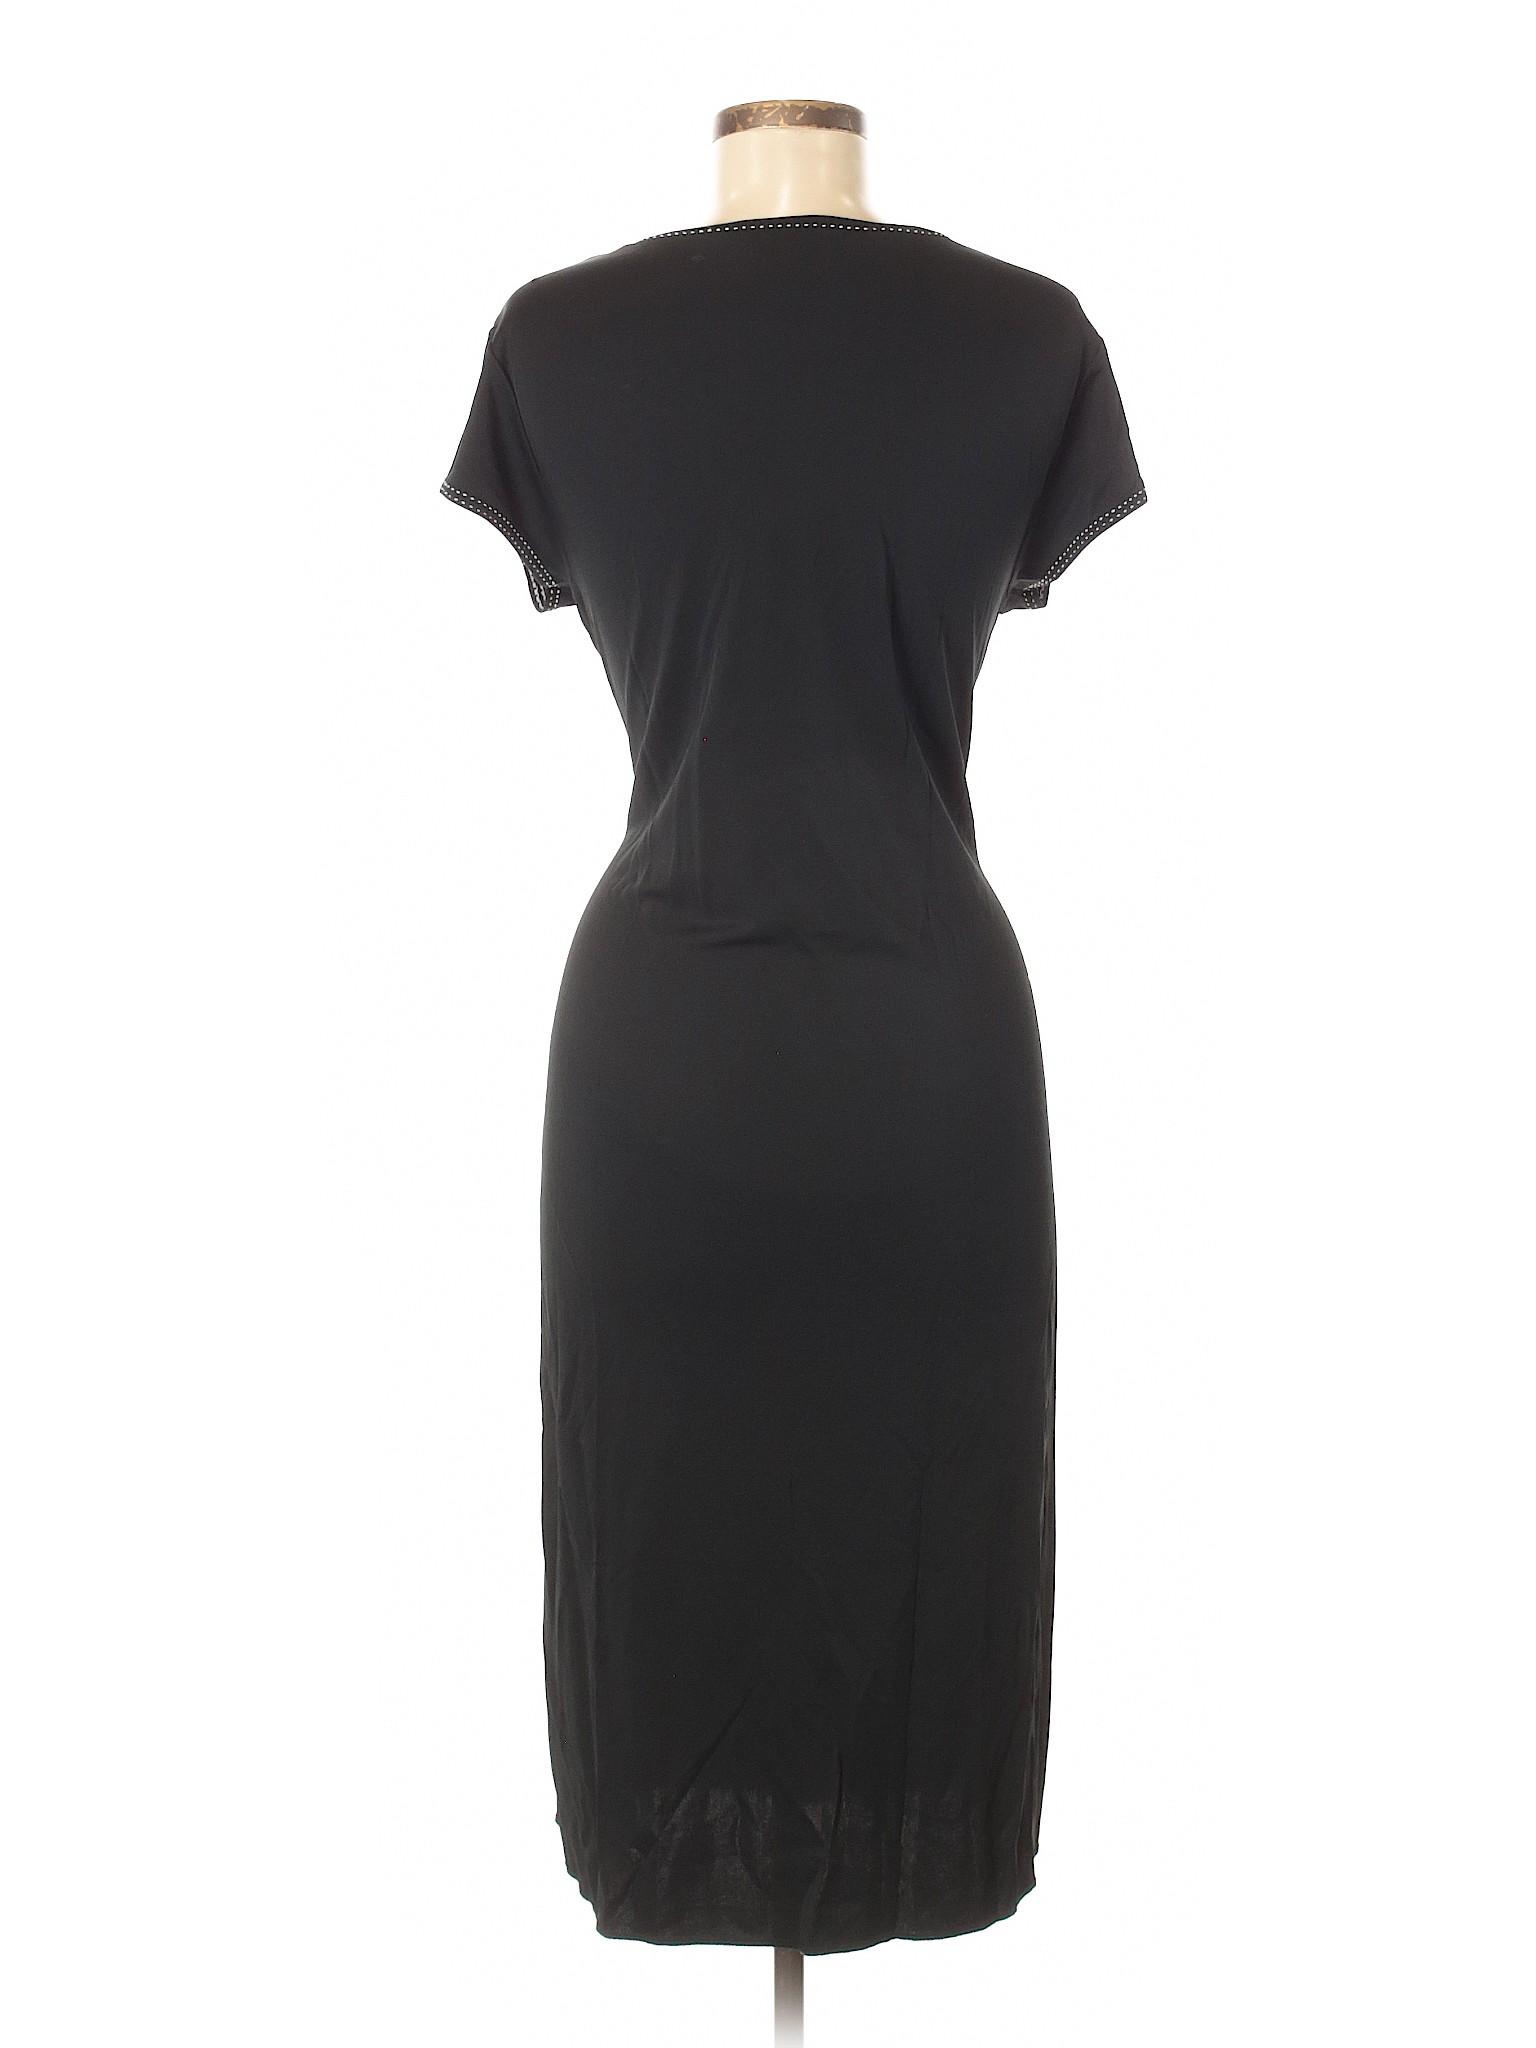 Jones New York Selling Casual Dress 5dqxwCnR